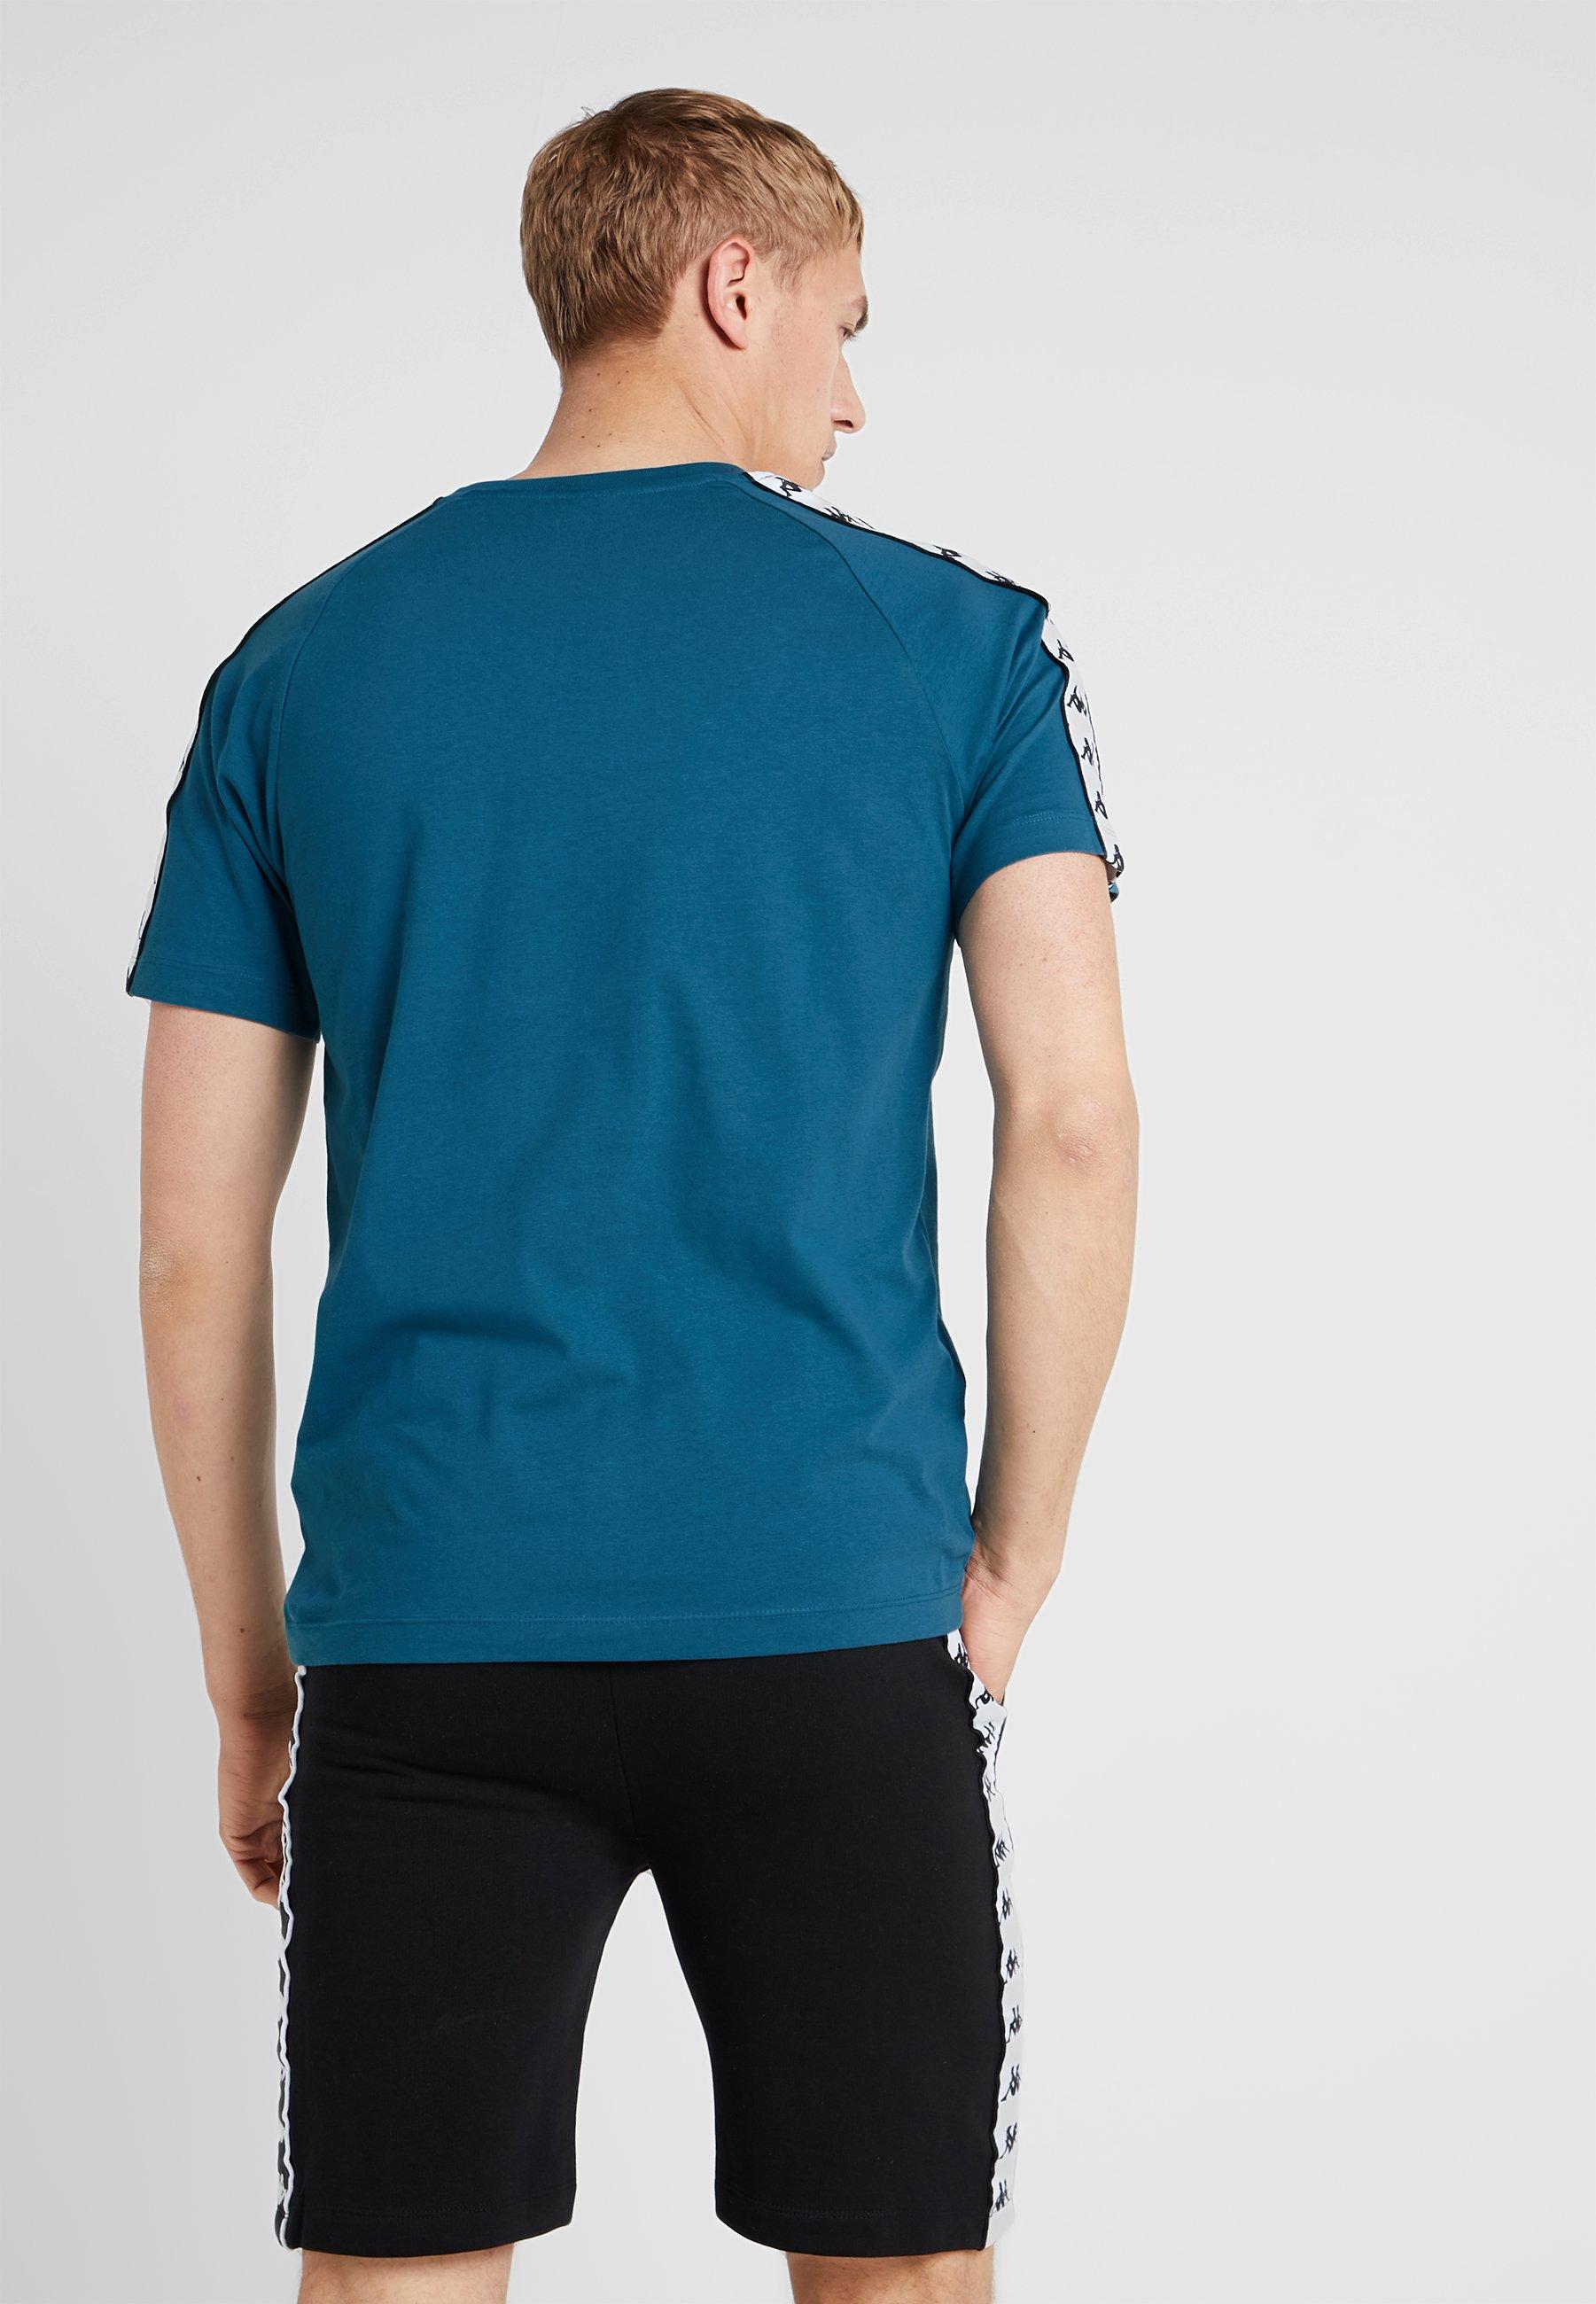 Kappa Blue FinleyT shirt Imprimé Coral zVpLUqGSM